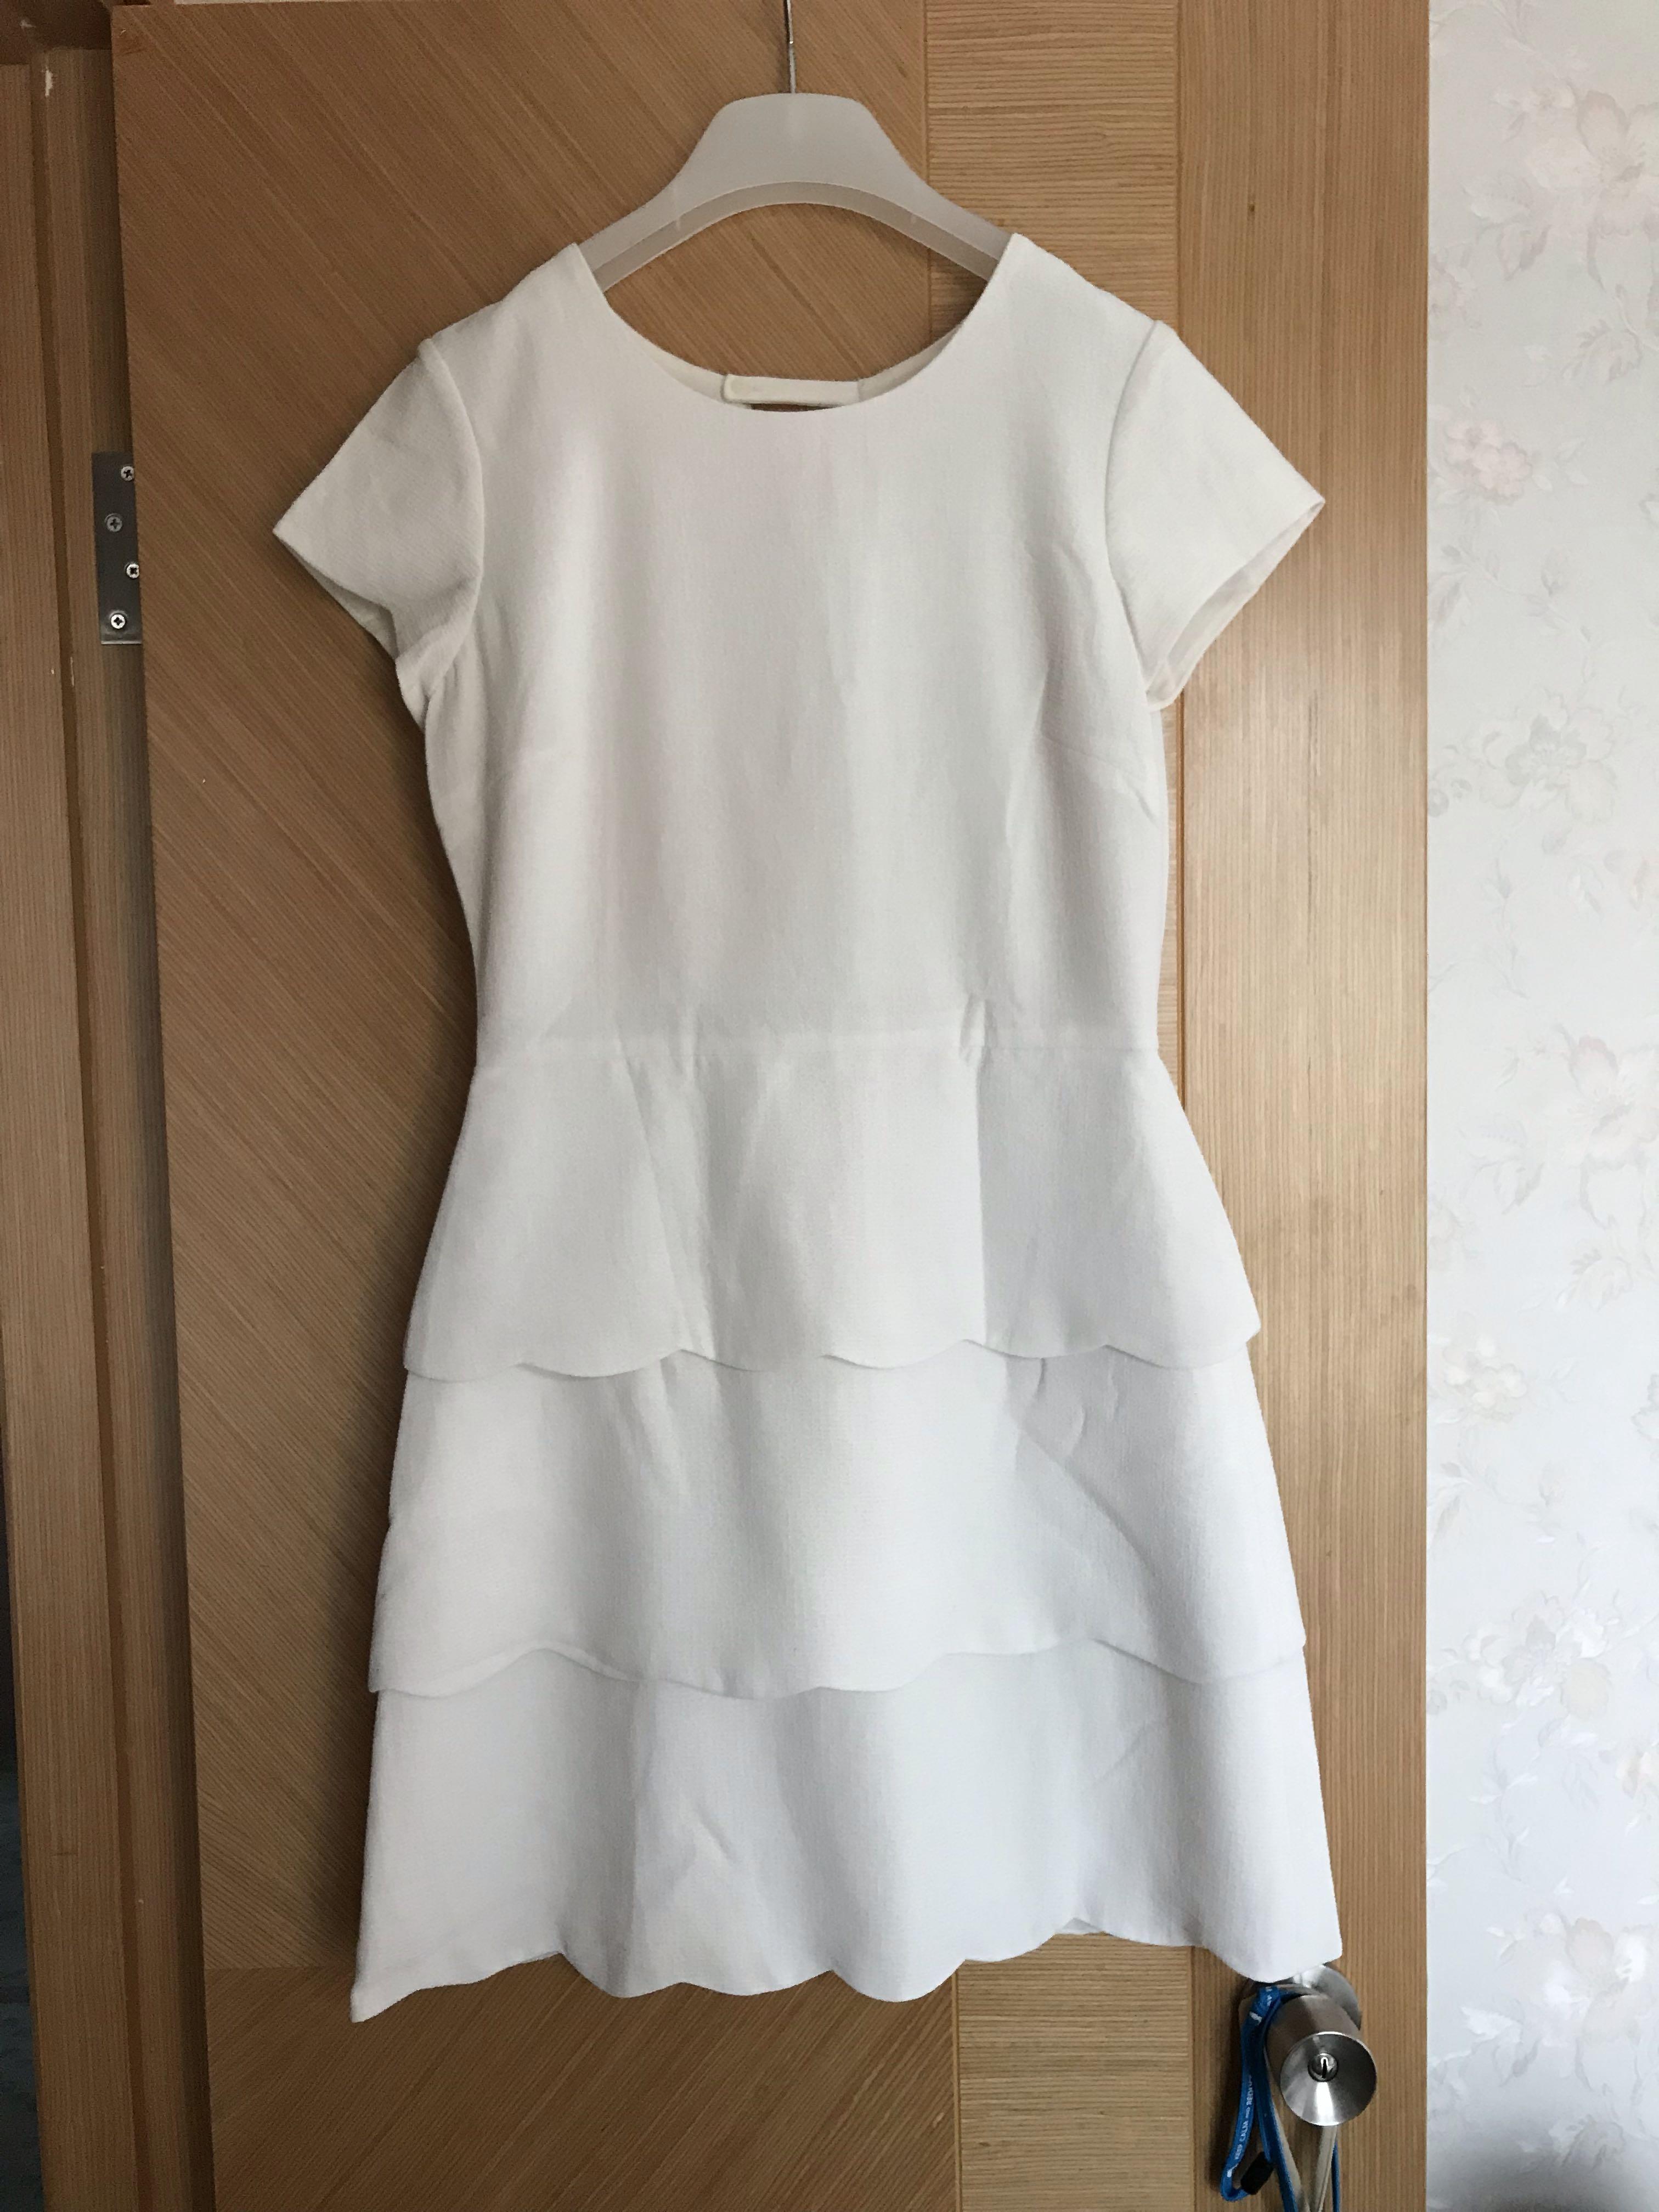 club monaco Dress白色連身裙